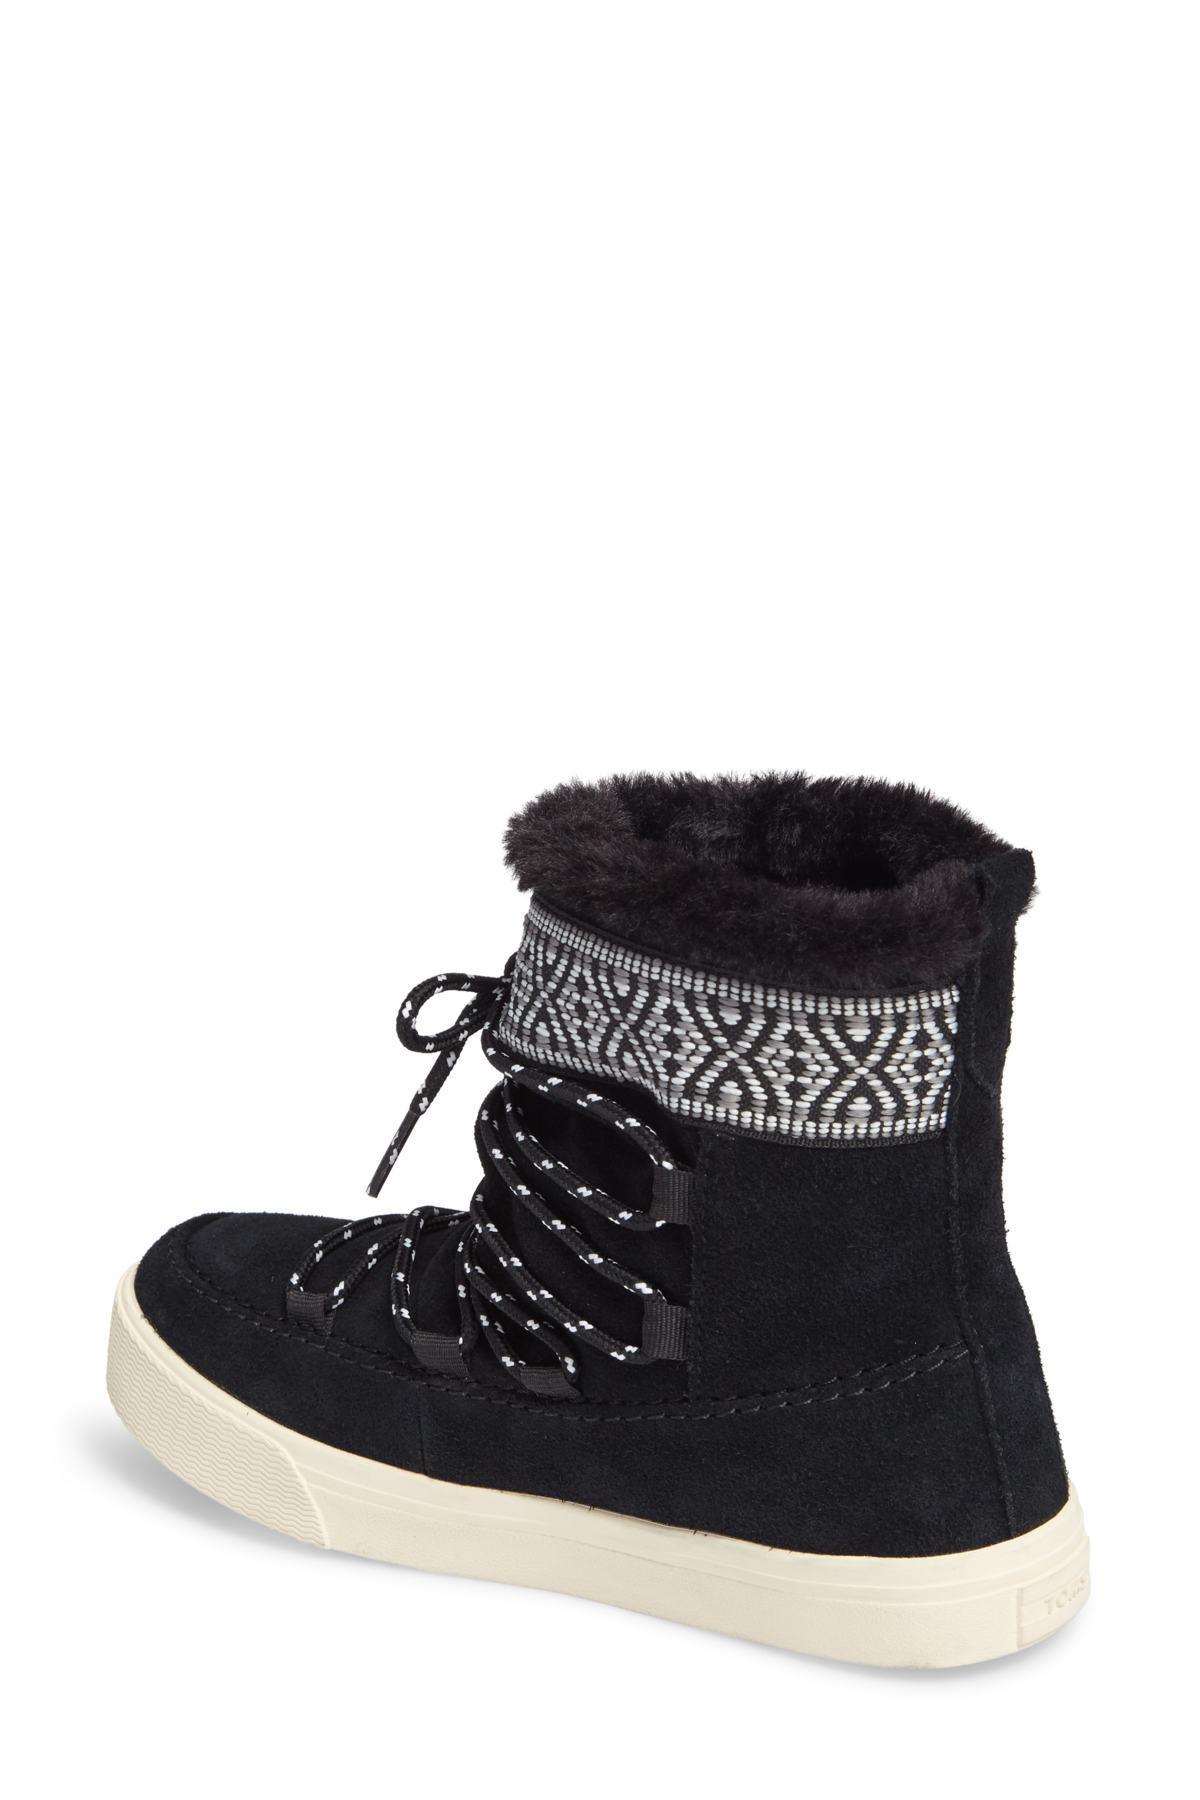 e93617053df Lyst - TOMS Alpine Boot (women) in Black - Save 51%